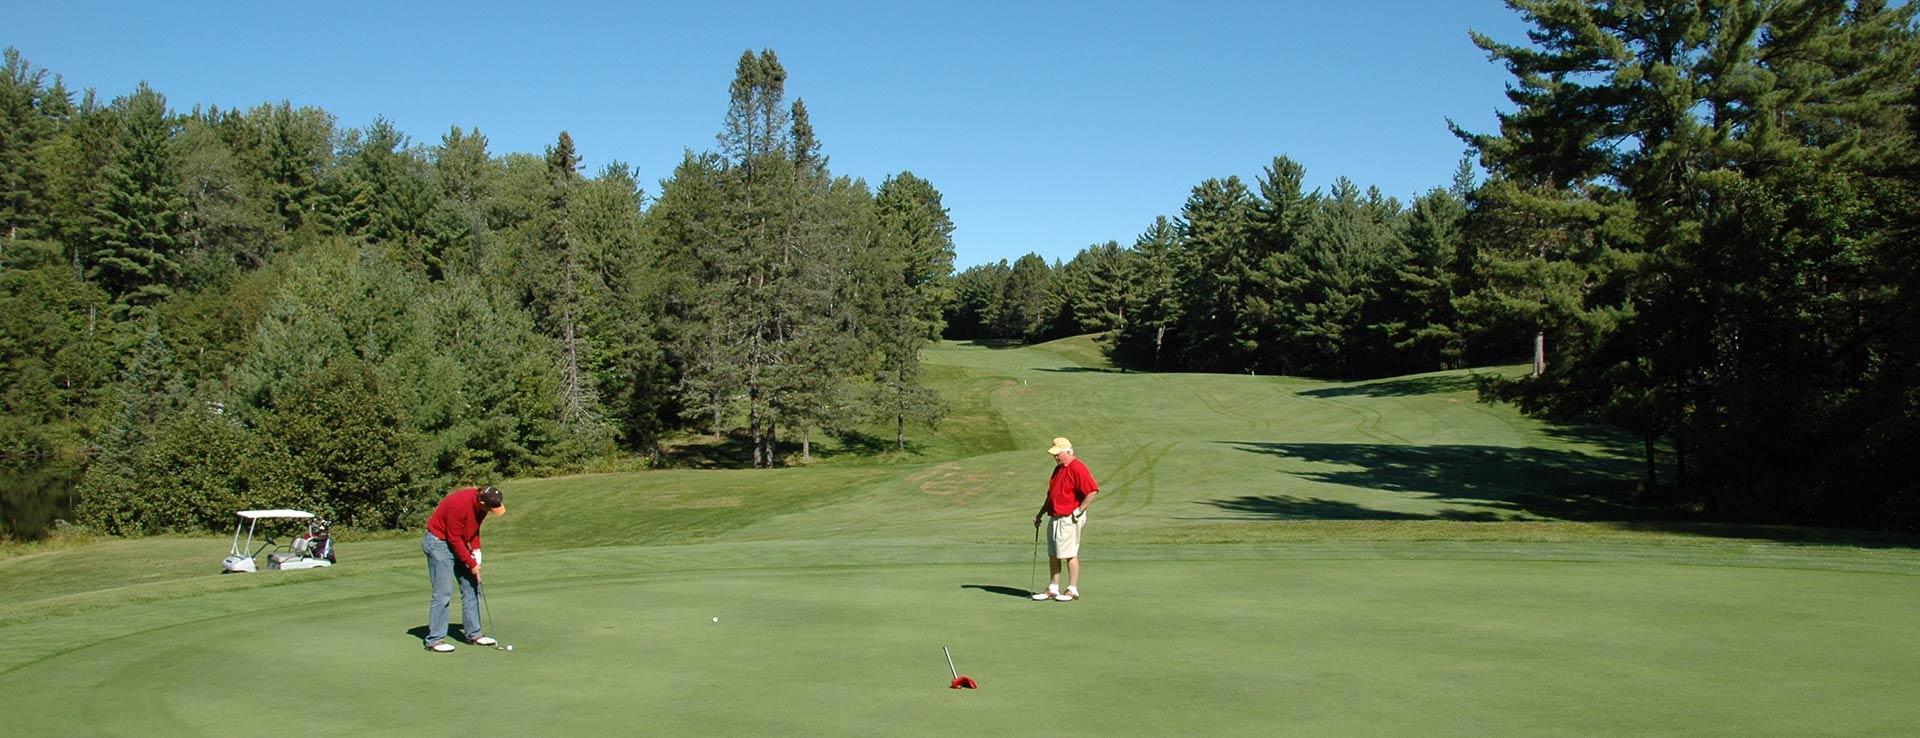 slider-golf